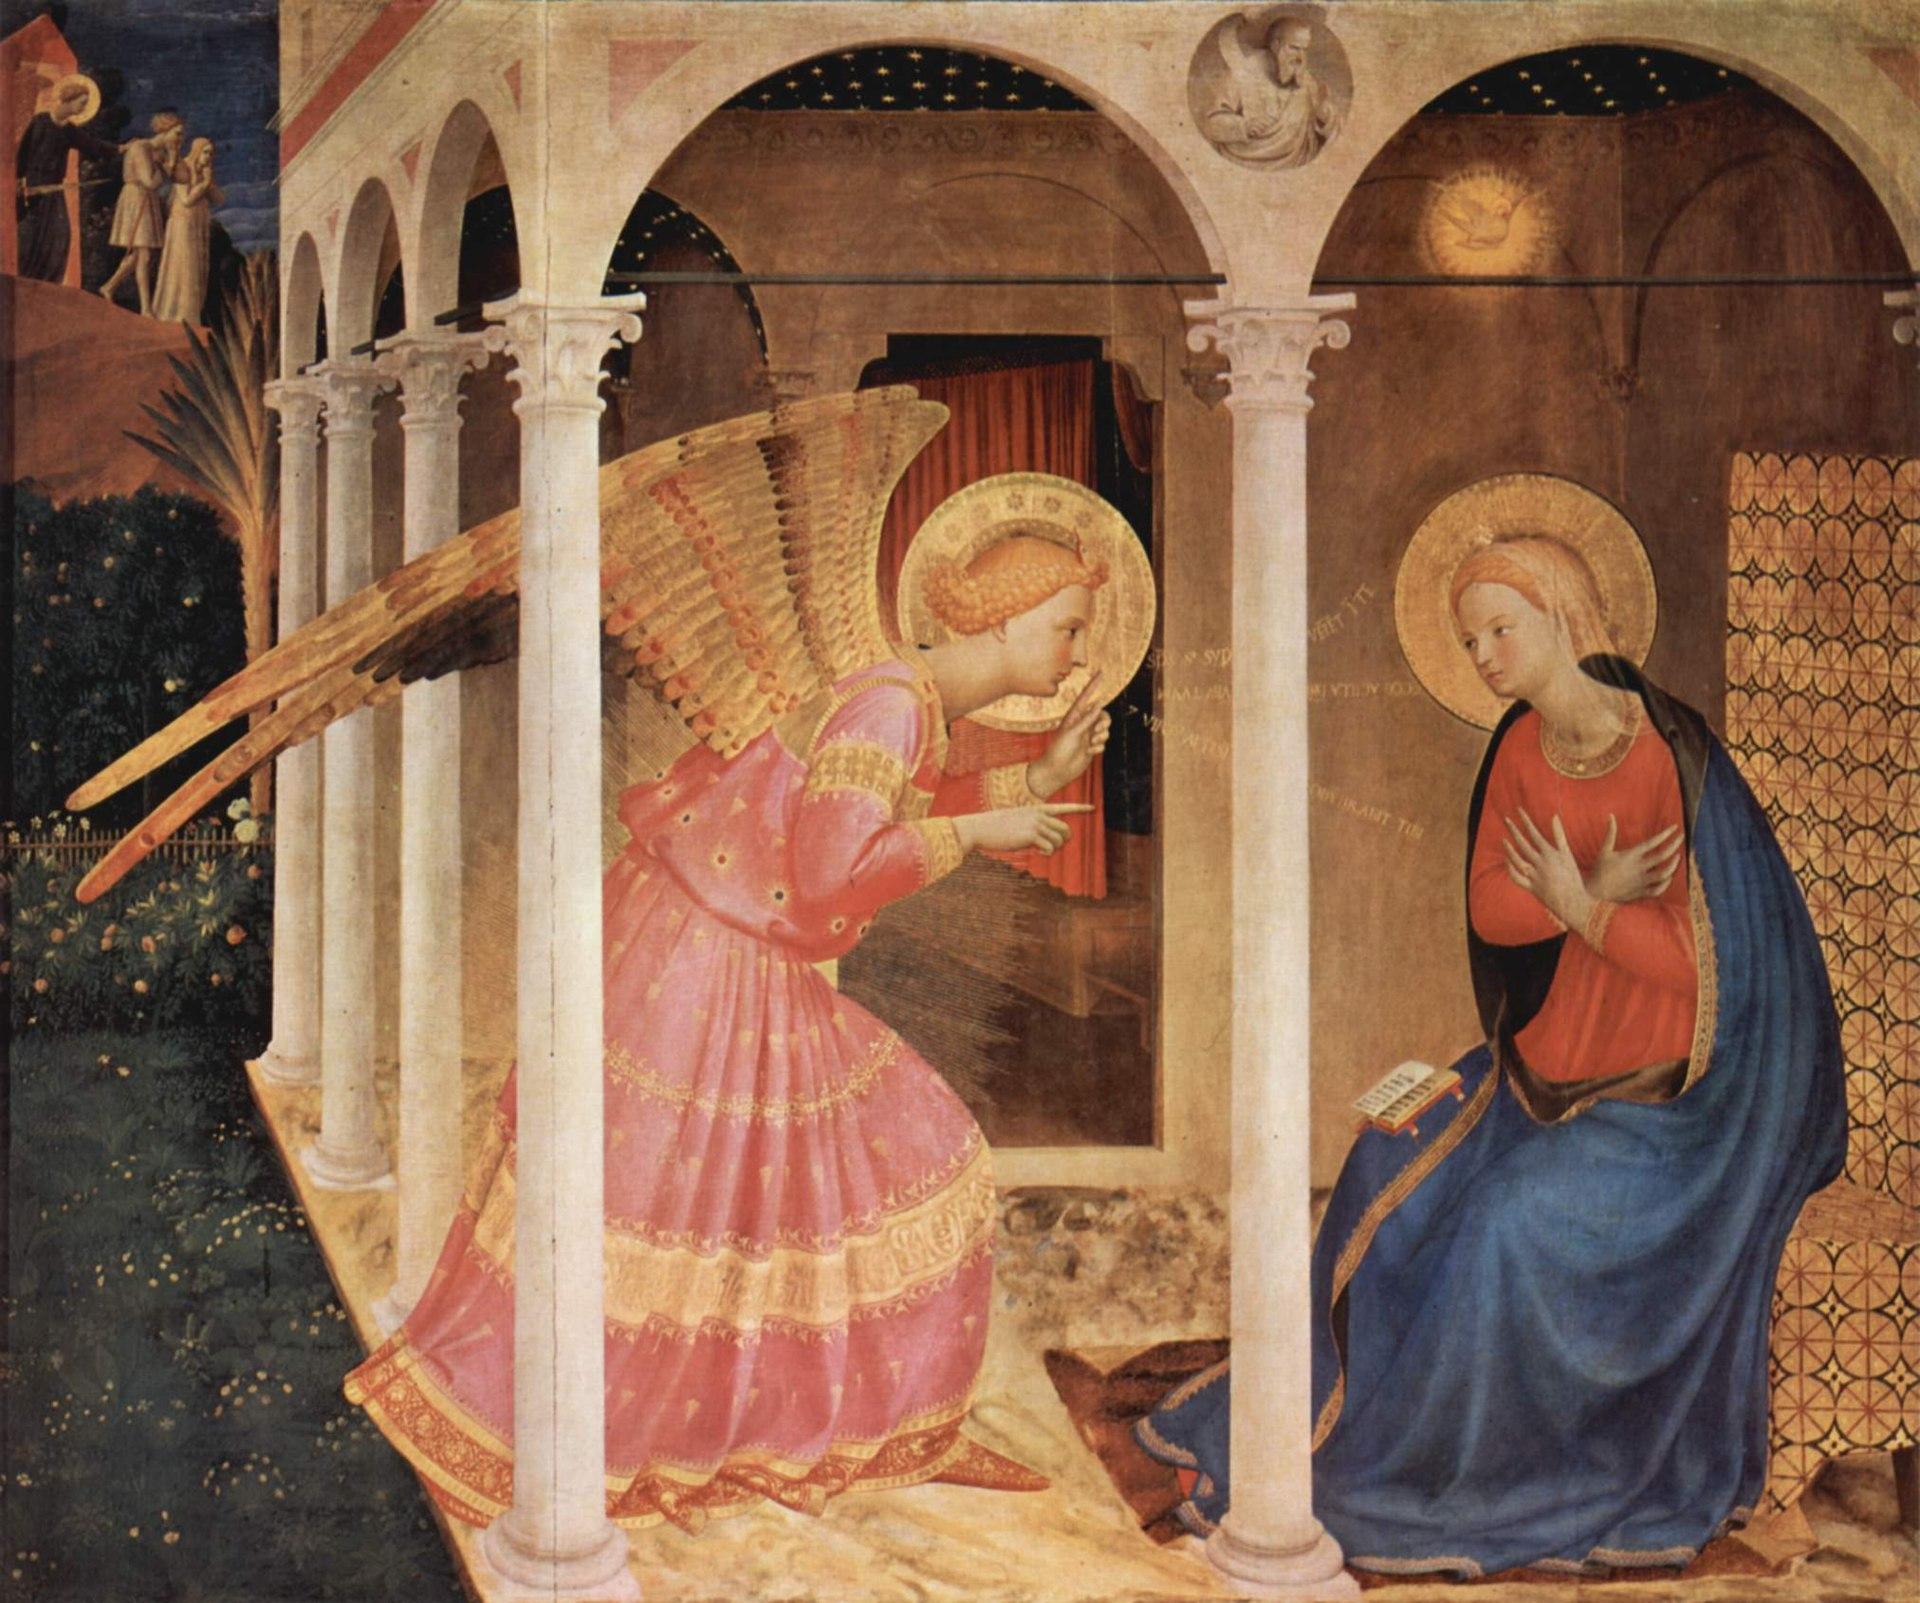 Fra Angelico, Annunciation (c. 1438), Diocesan Museum, Cortona